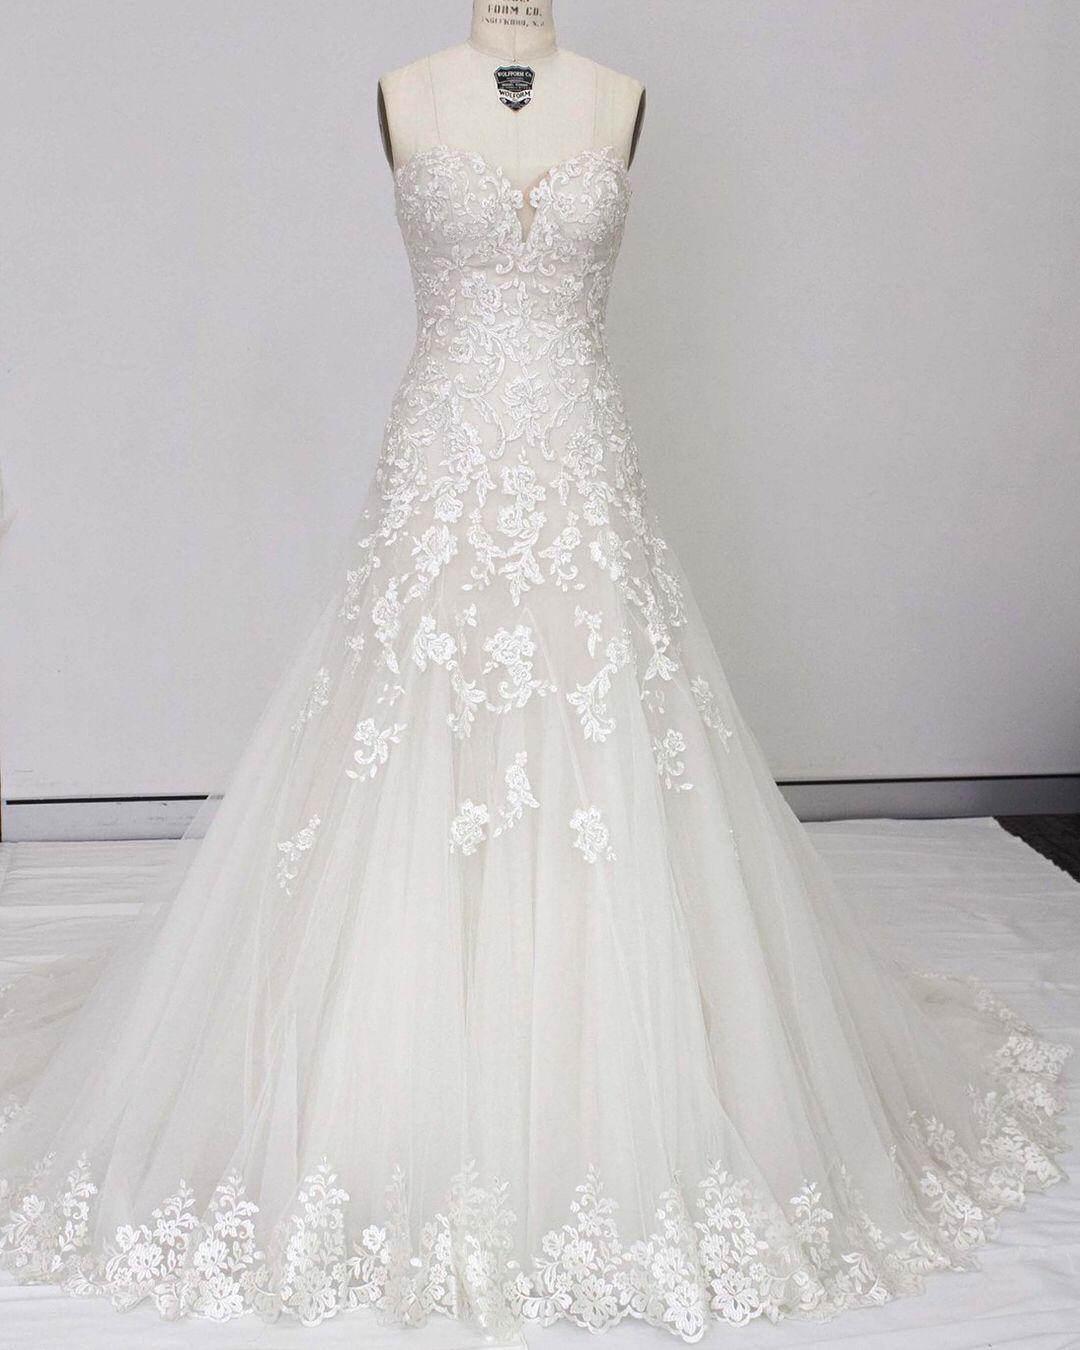 Strapless Dropped Waist Lace Fairytale Wedding Dress